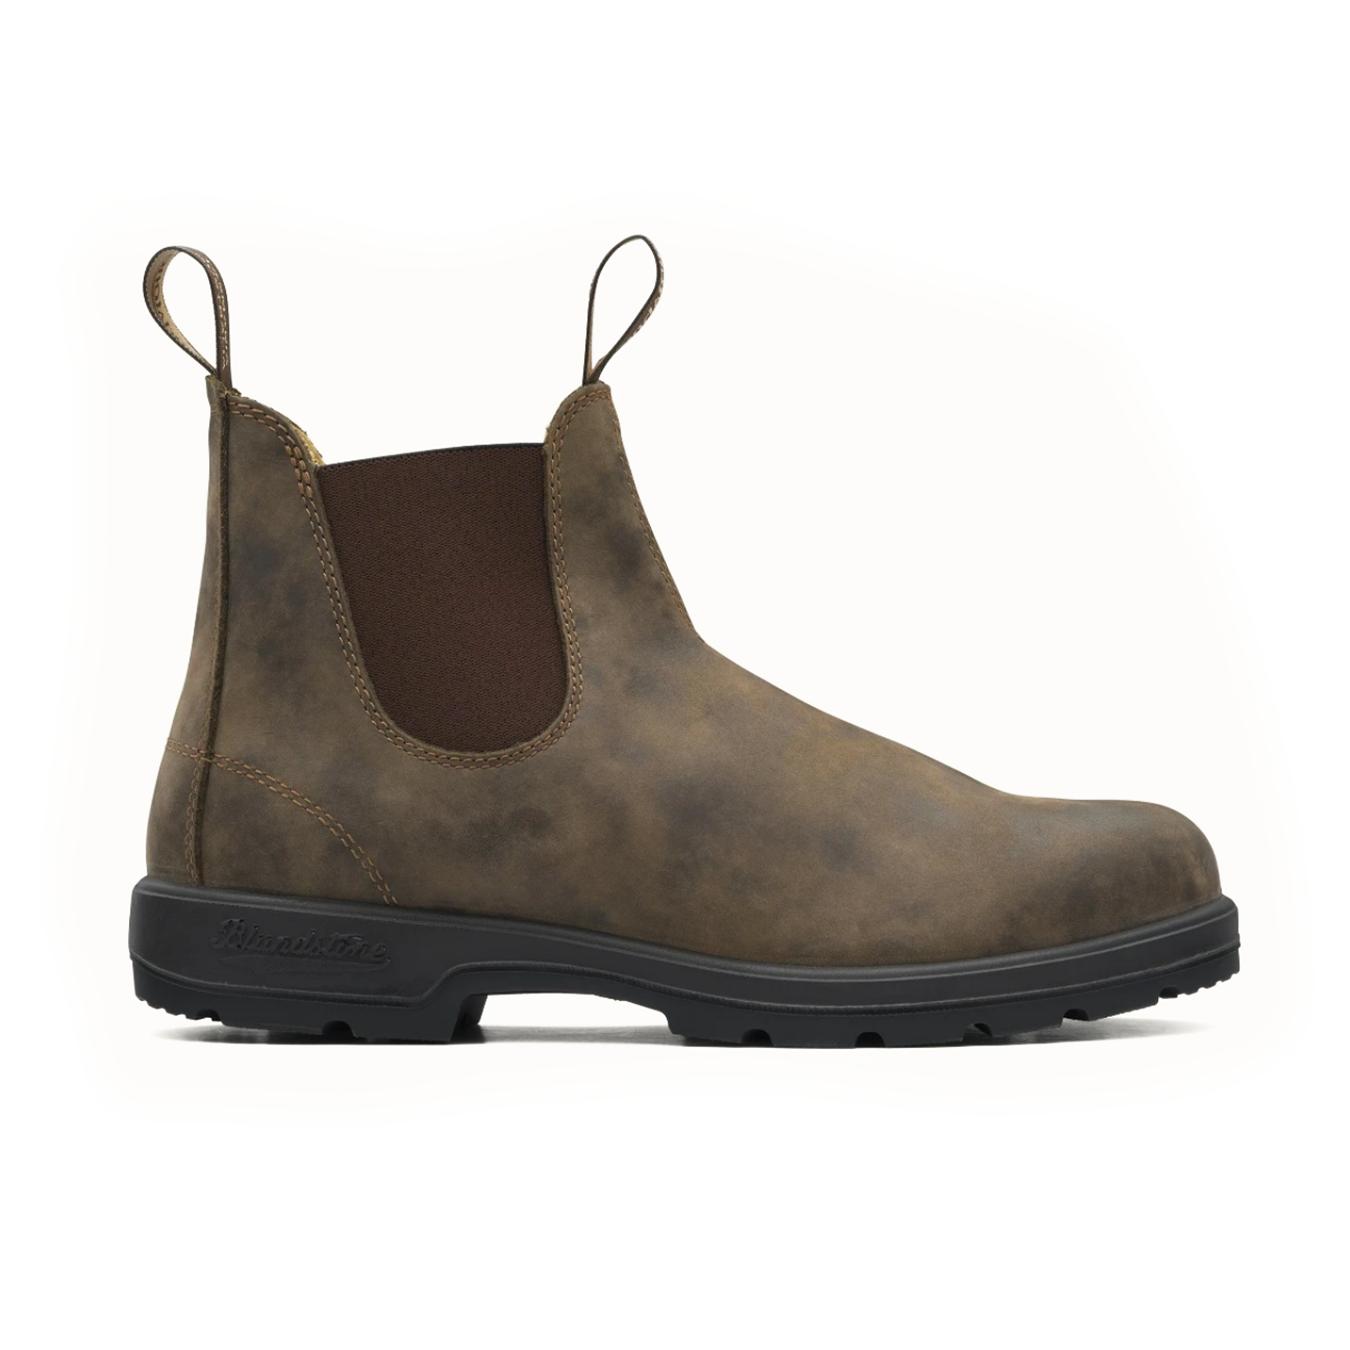 Chelsea Boot, Rustic Brown-1